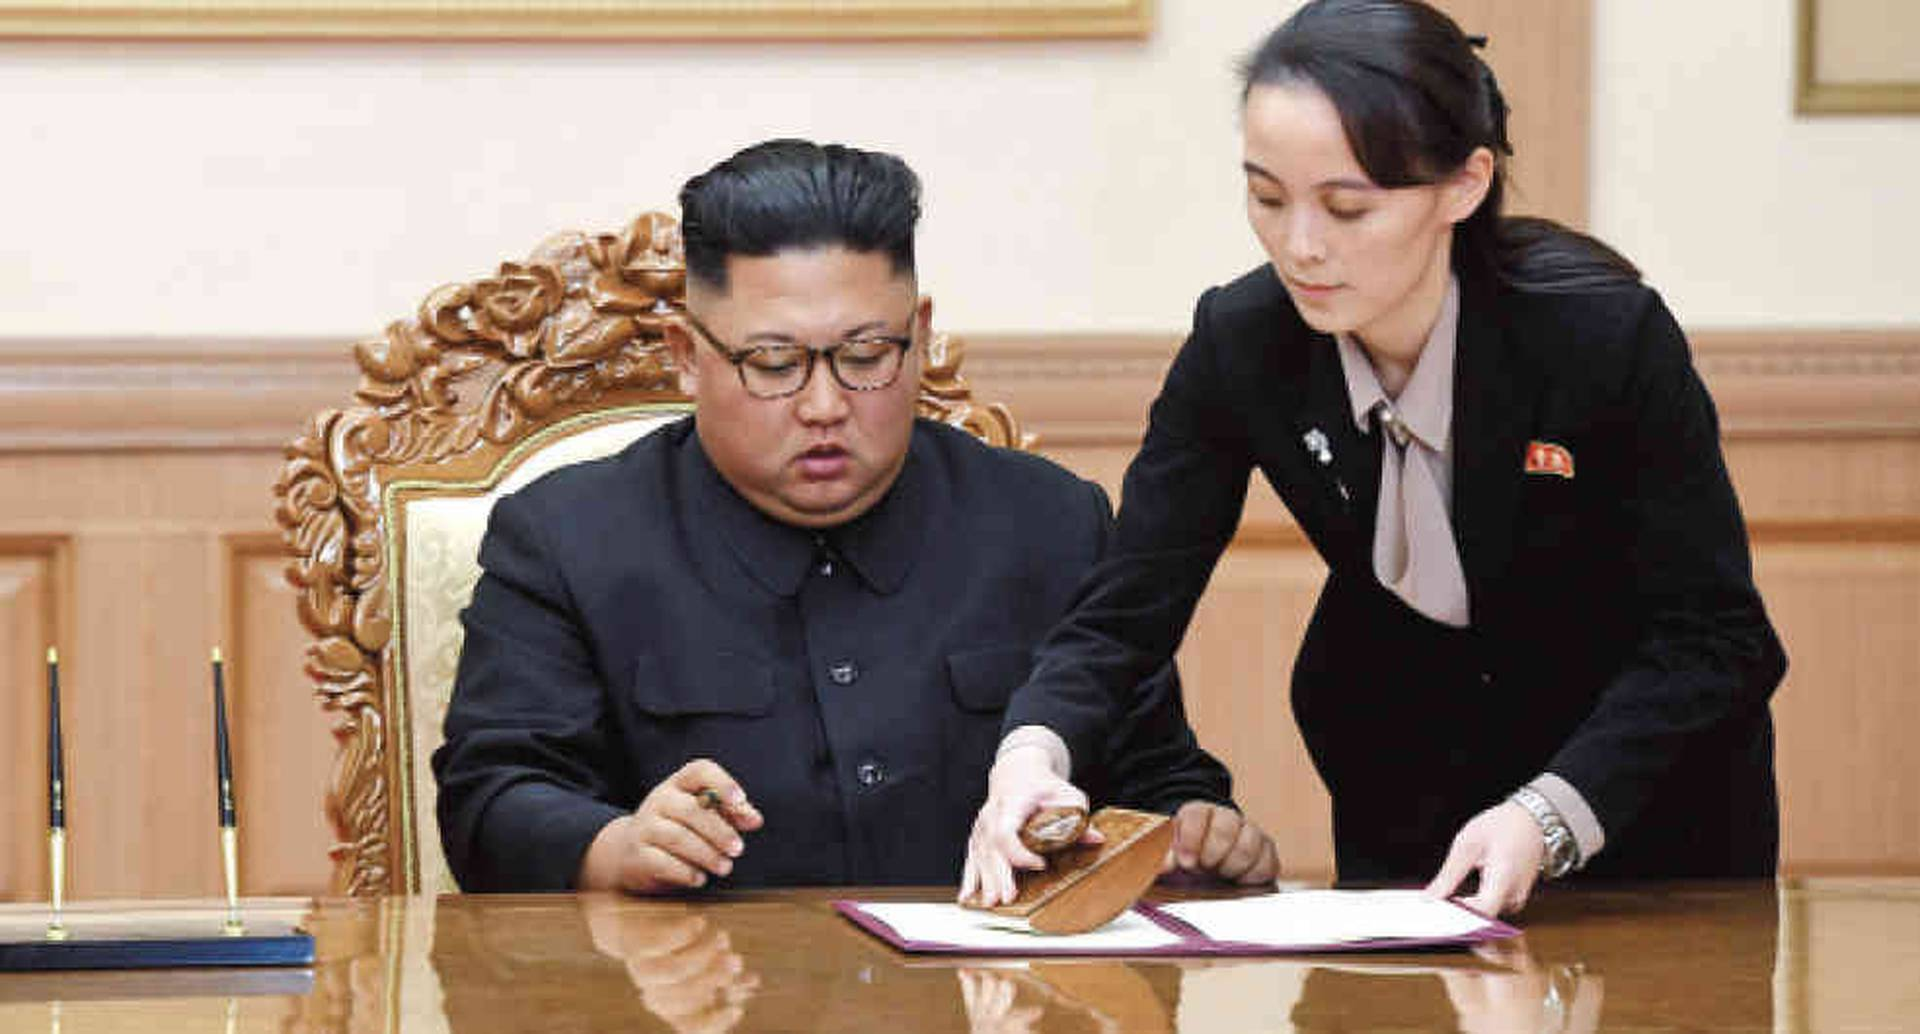 La hermana del líder norcoreano amenaza a Corea del Sur/Foto: archivo SEMANA